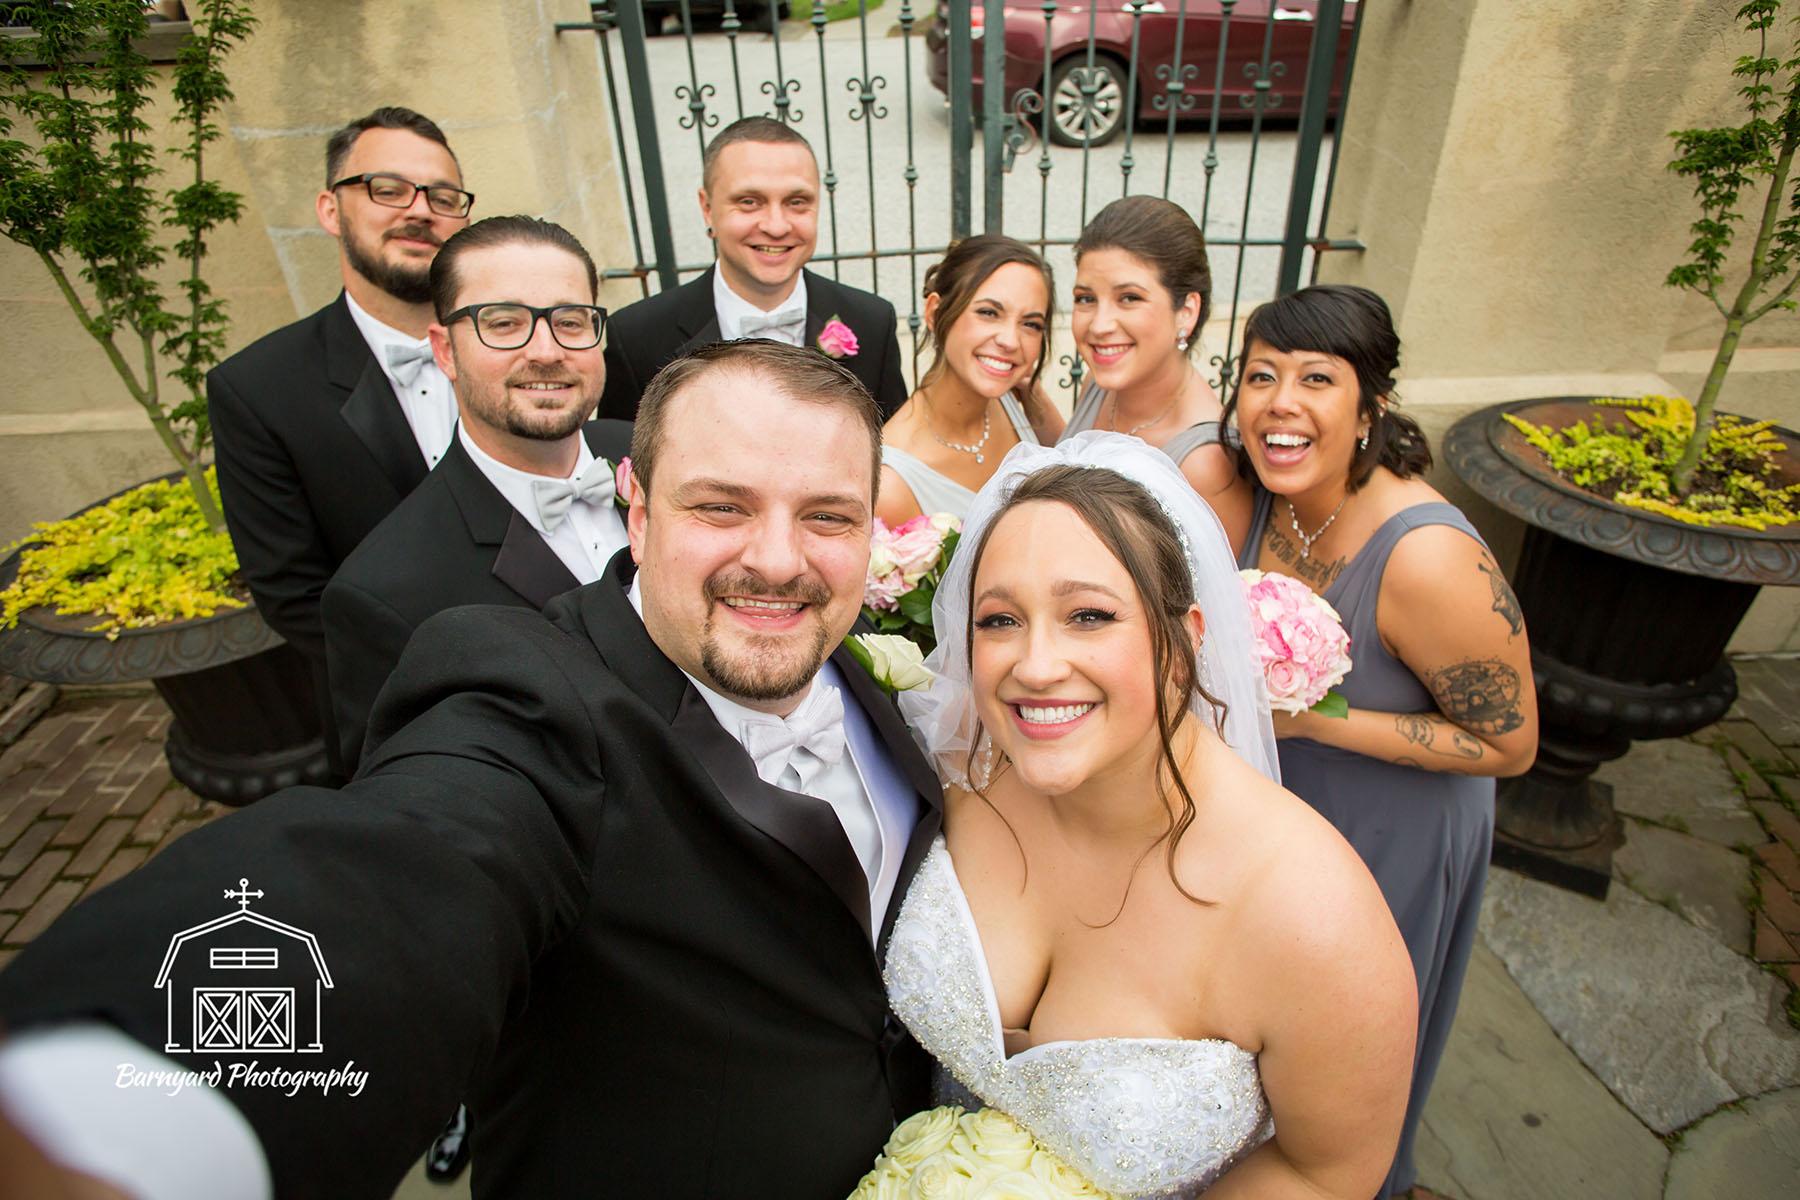 Courtyard Wedding Party Selfie!